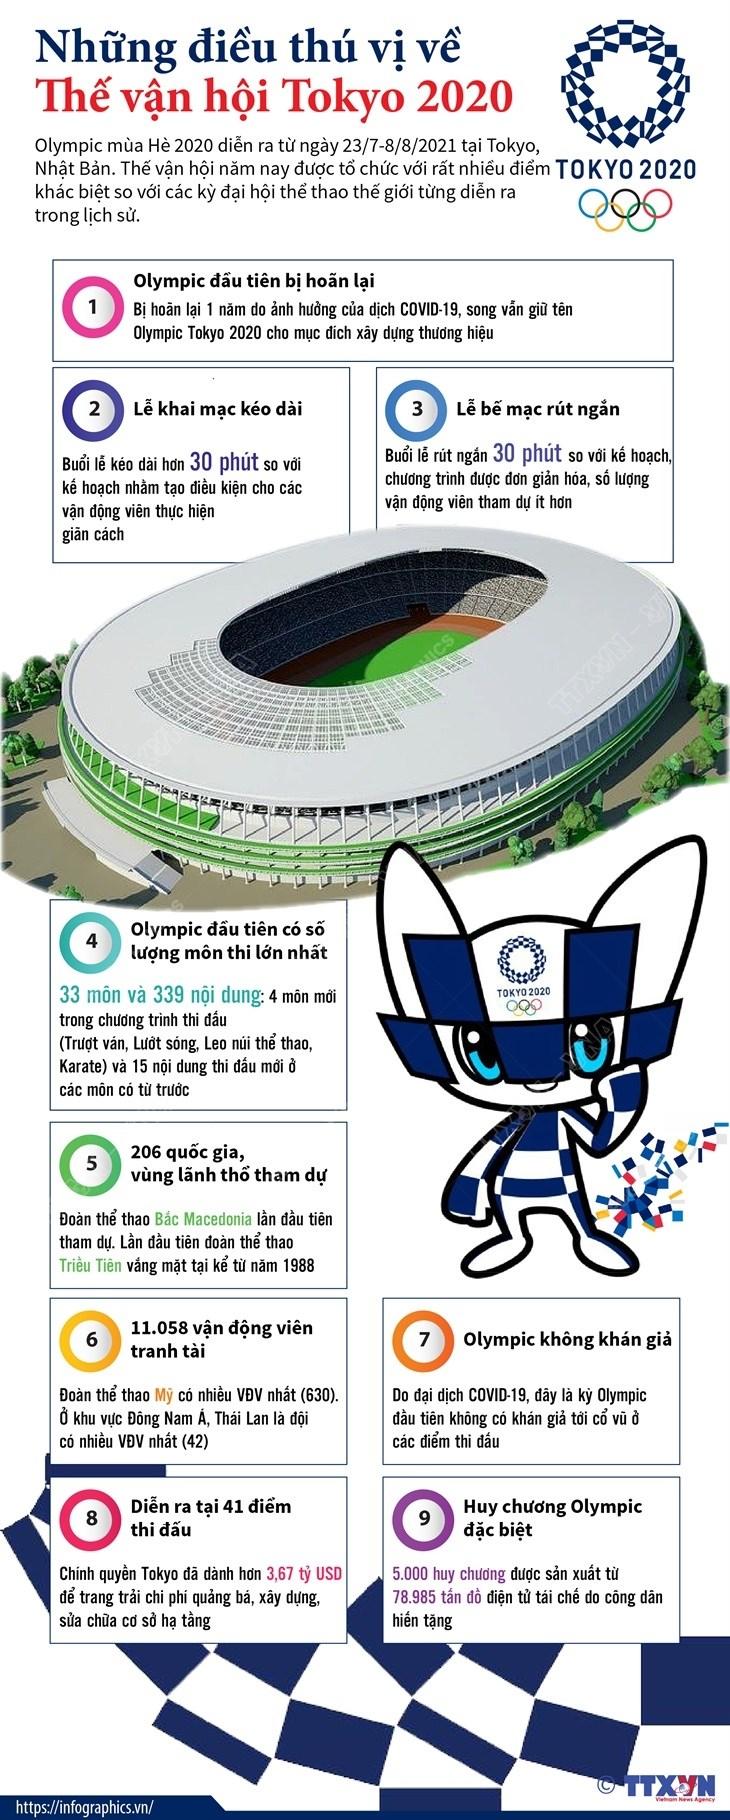 [Infographics] Nhung dieu thu vi ve The van hoi Tokyo 2020 hinh anh 1